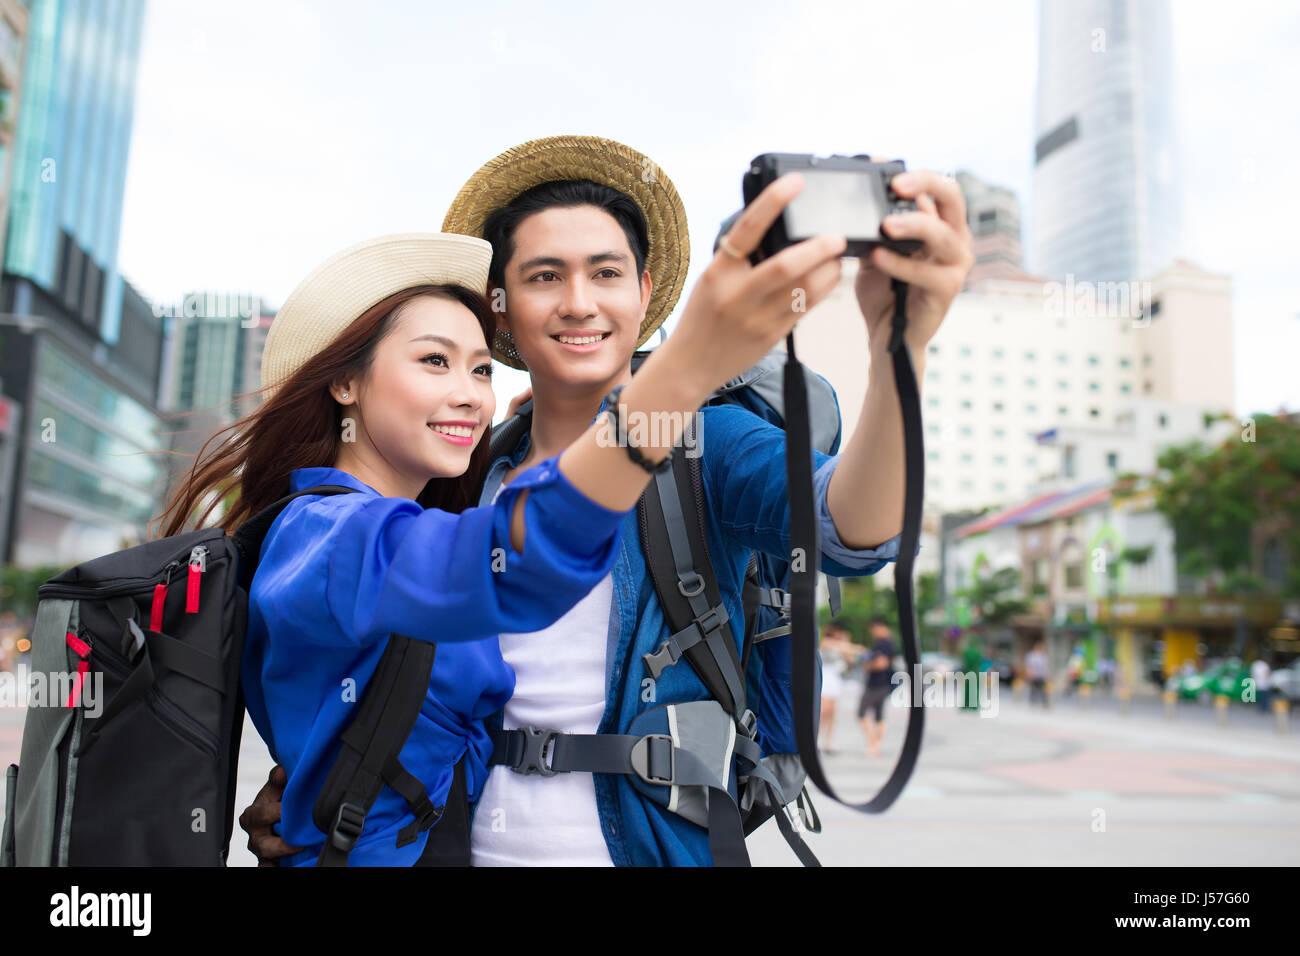 Dating turismo